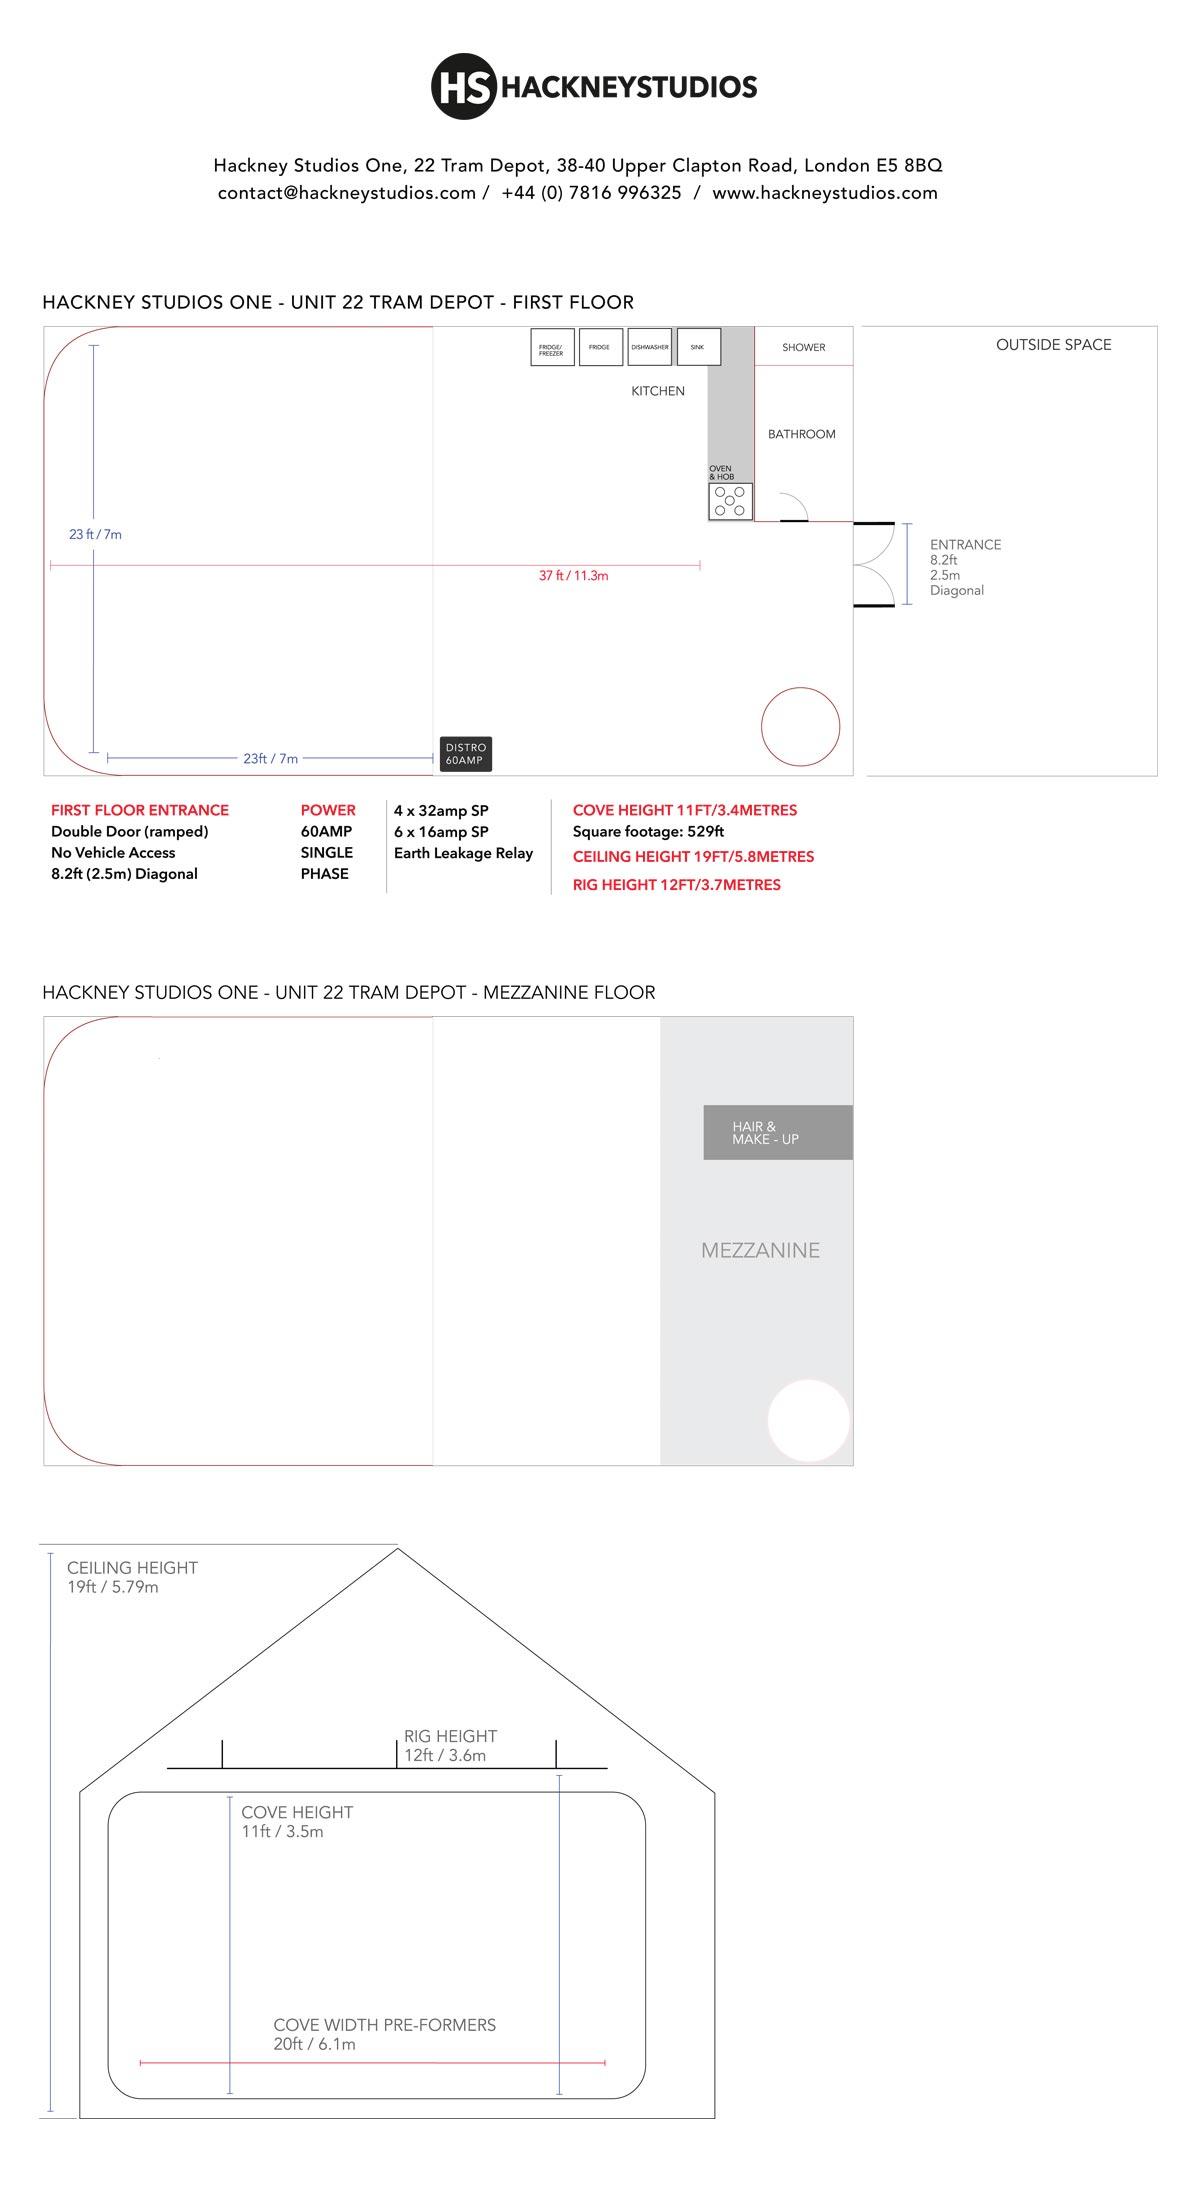 hackney_studios_one_plan